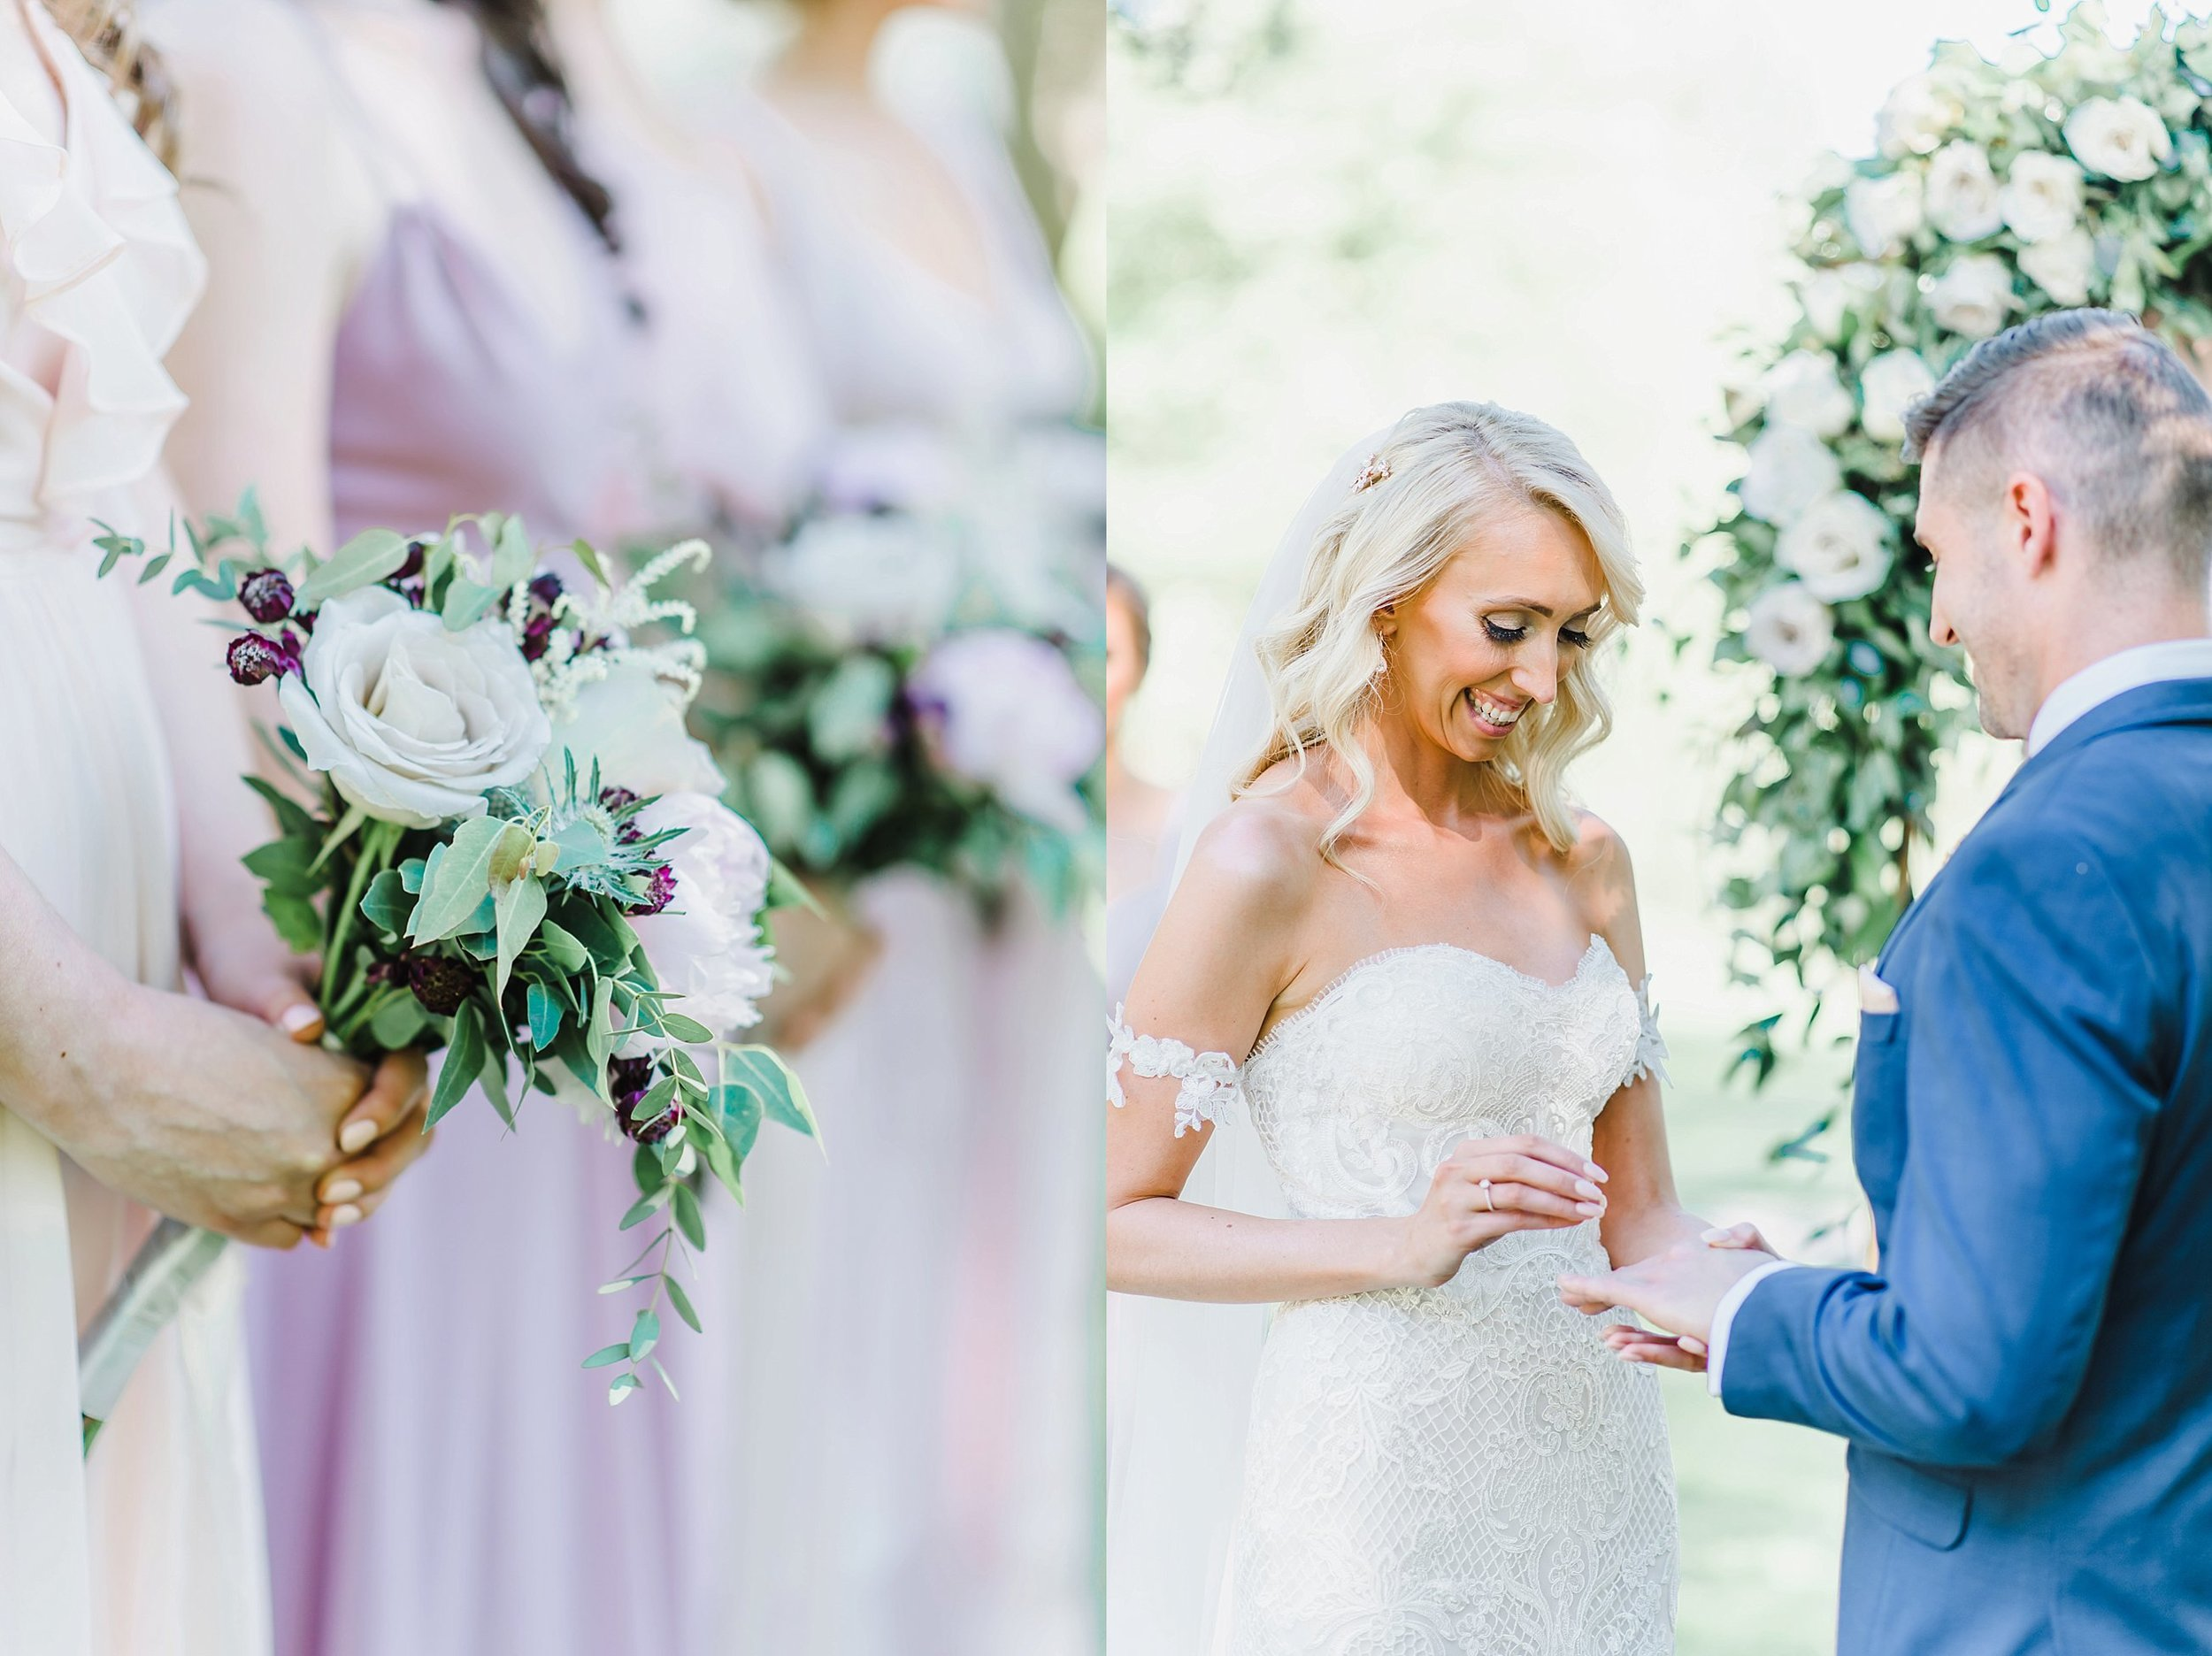 light airy indie fine art ottawa wedding photographer | Ali and Batoul Photography_0068.jpg